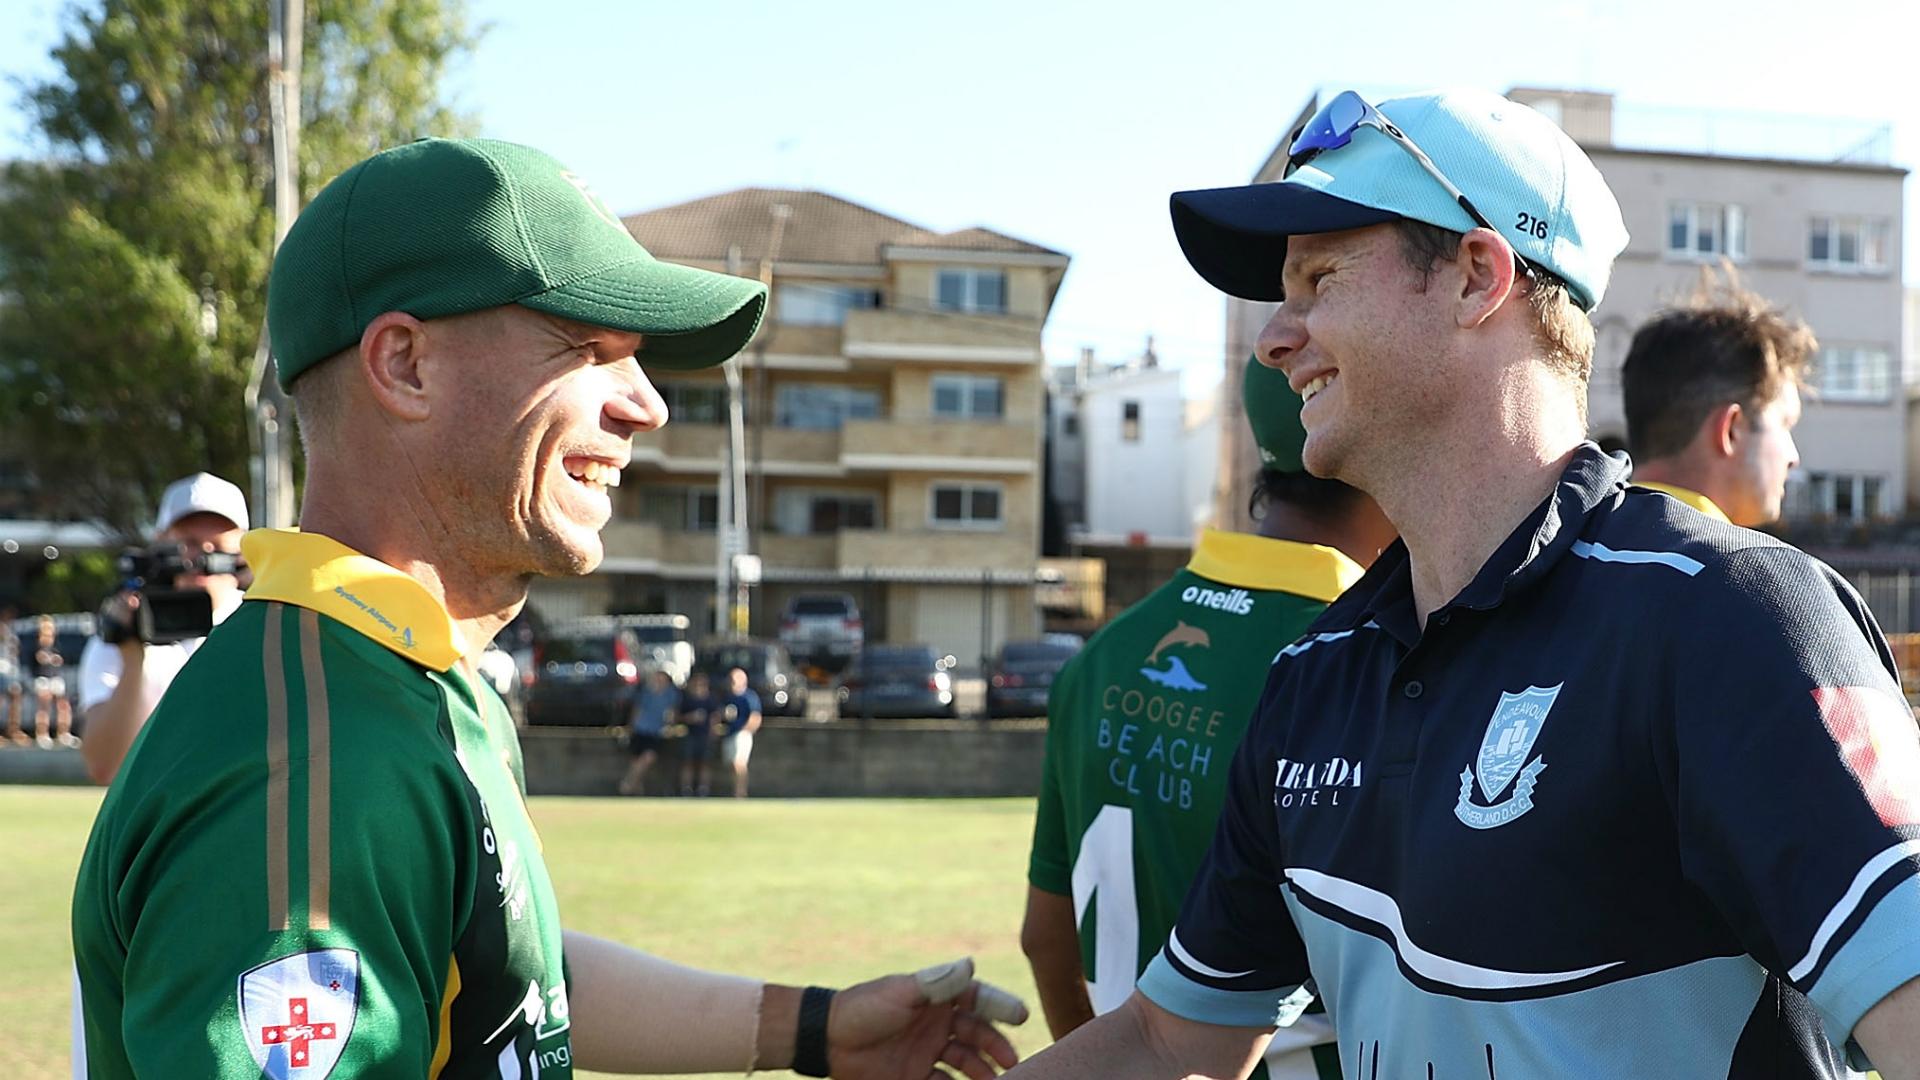 Australia beat Sri Lanka by 366 runs to win series 2-0